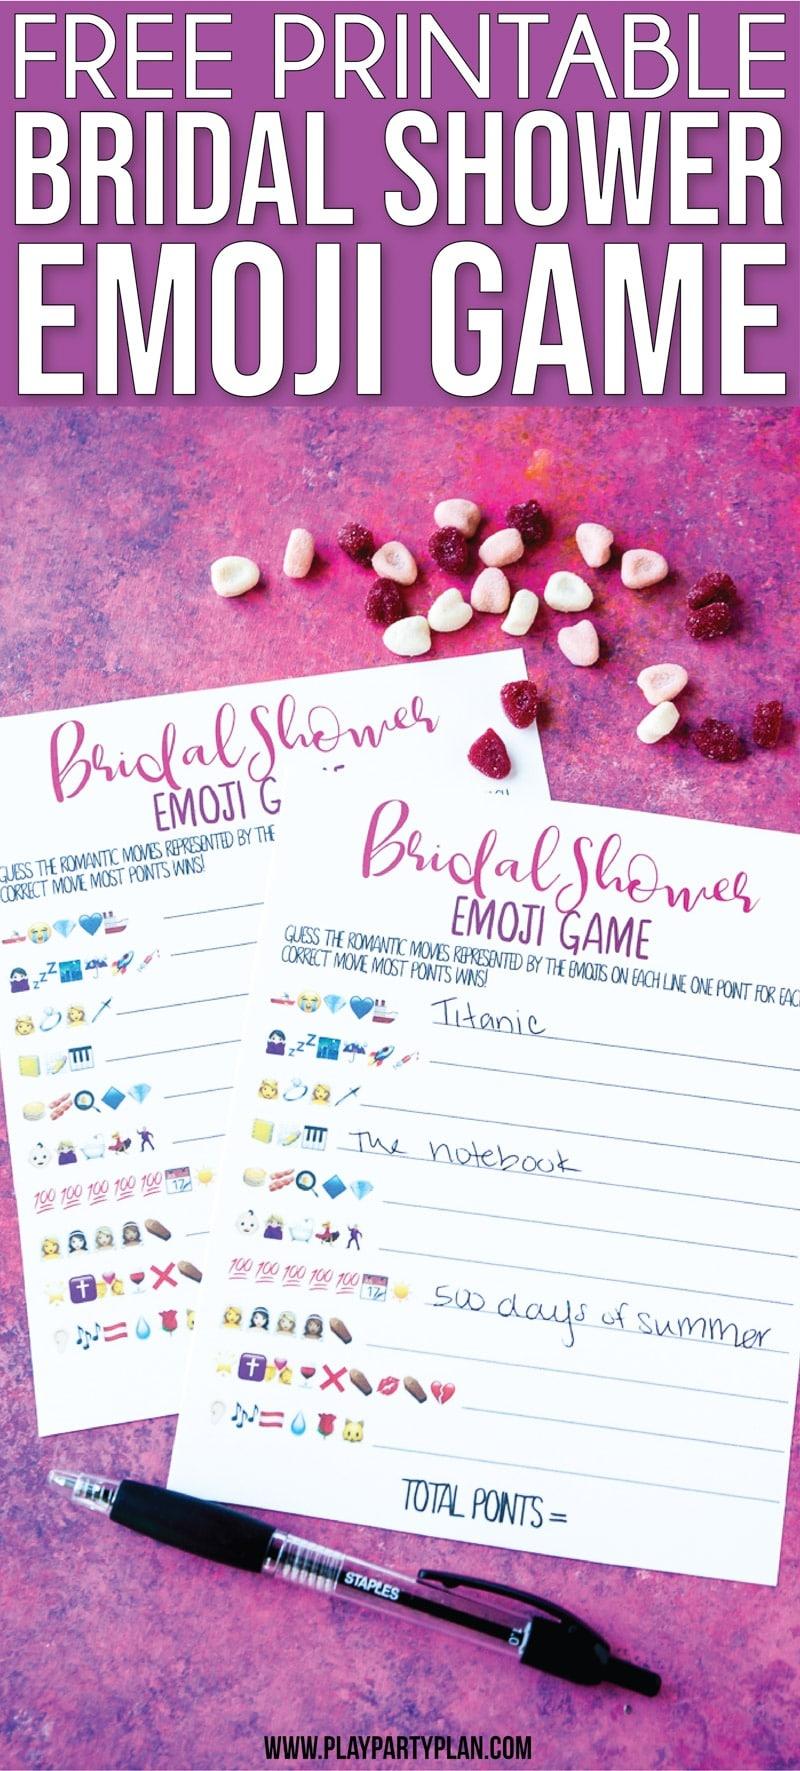 Free Printable Bridal Shower Name The Emoji Game - Free Printable Group Games